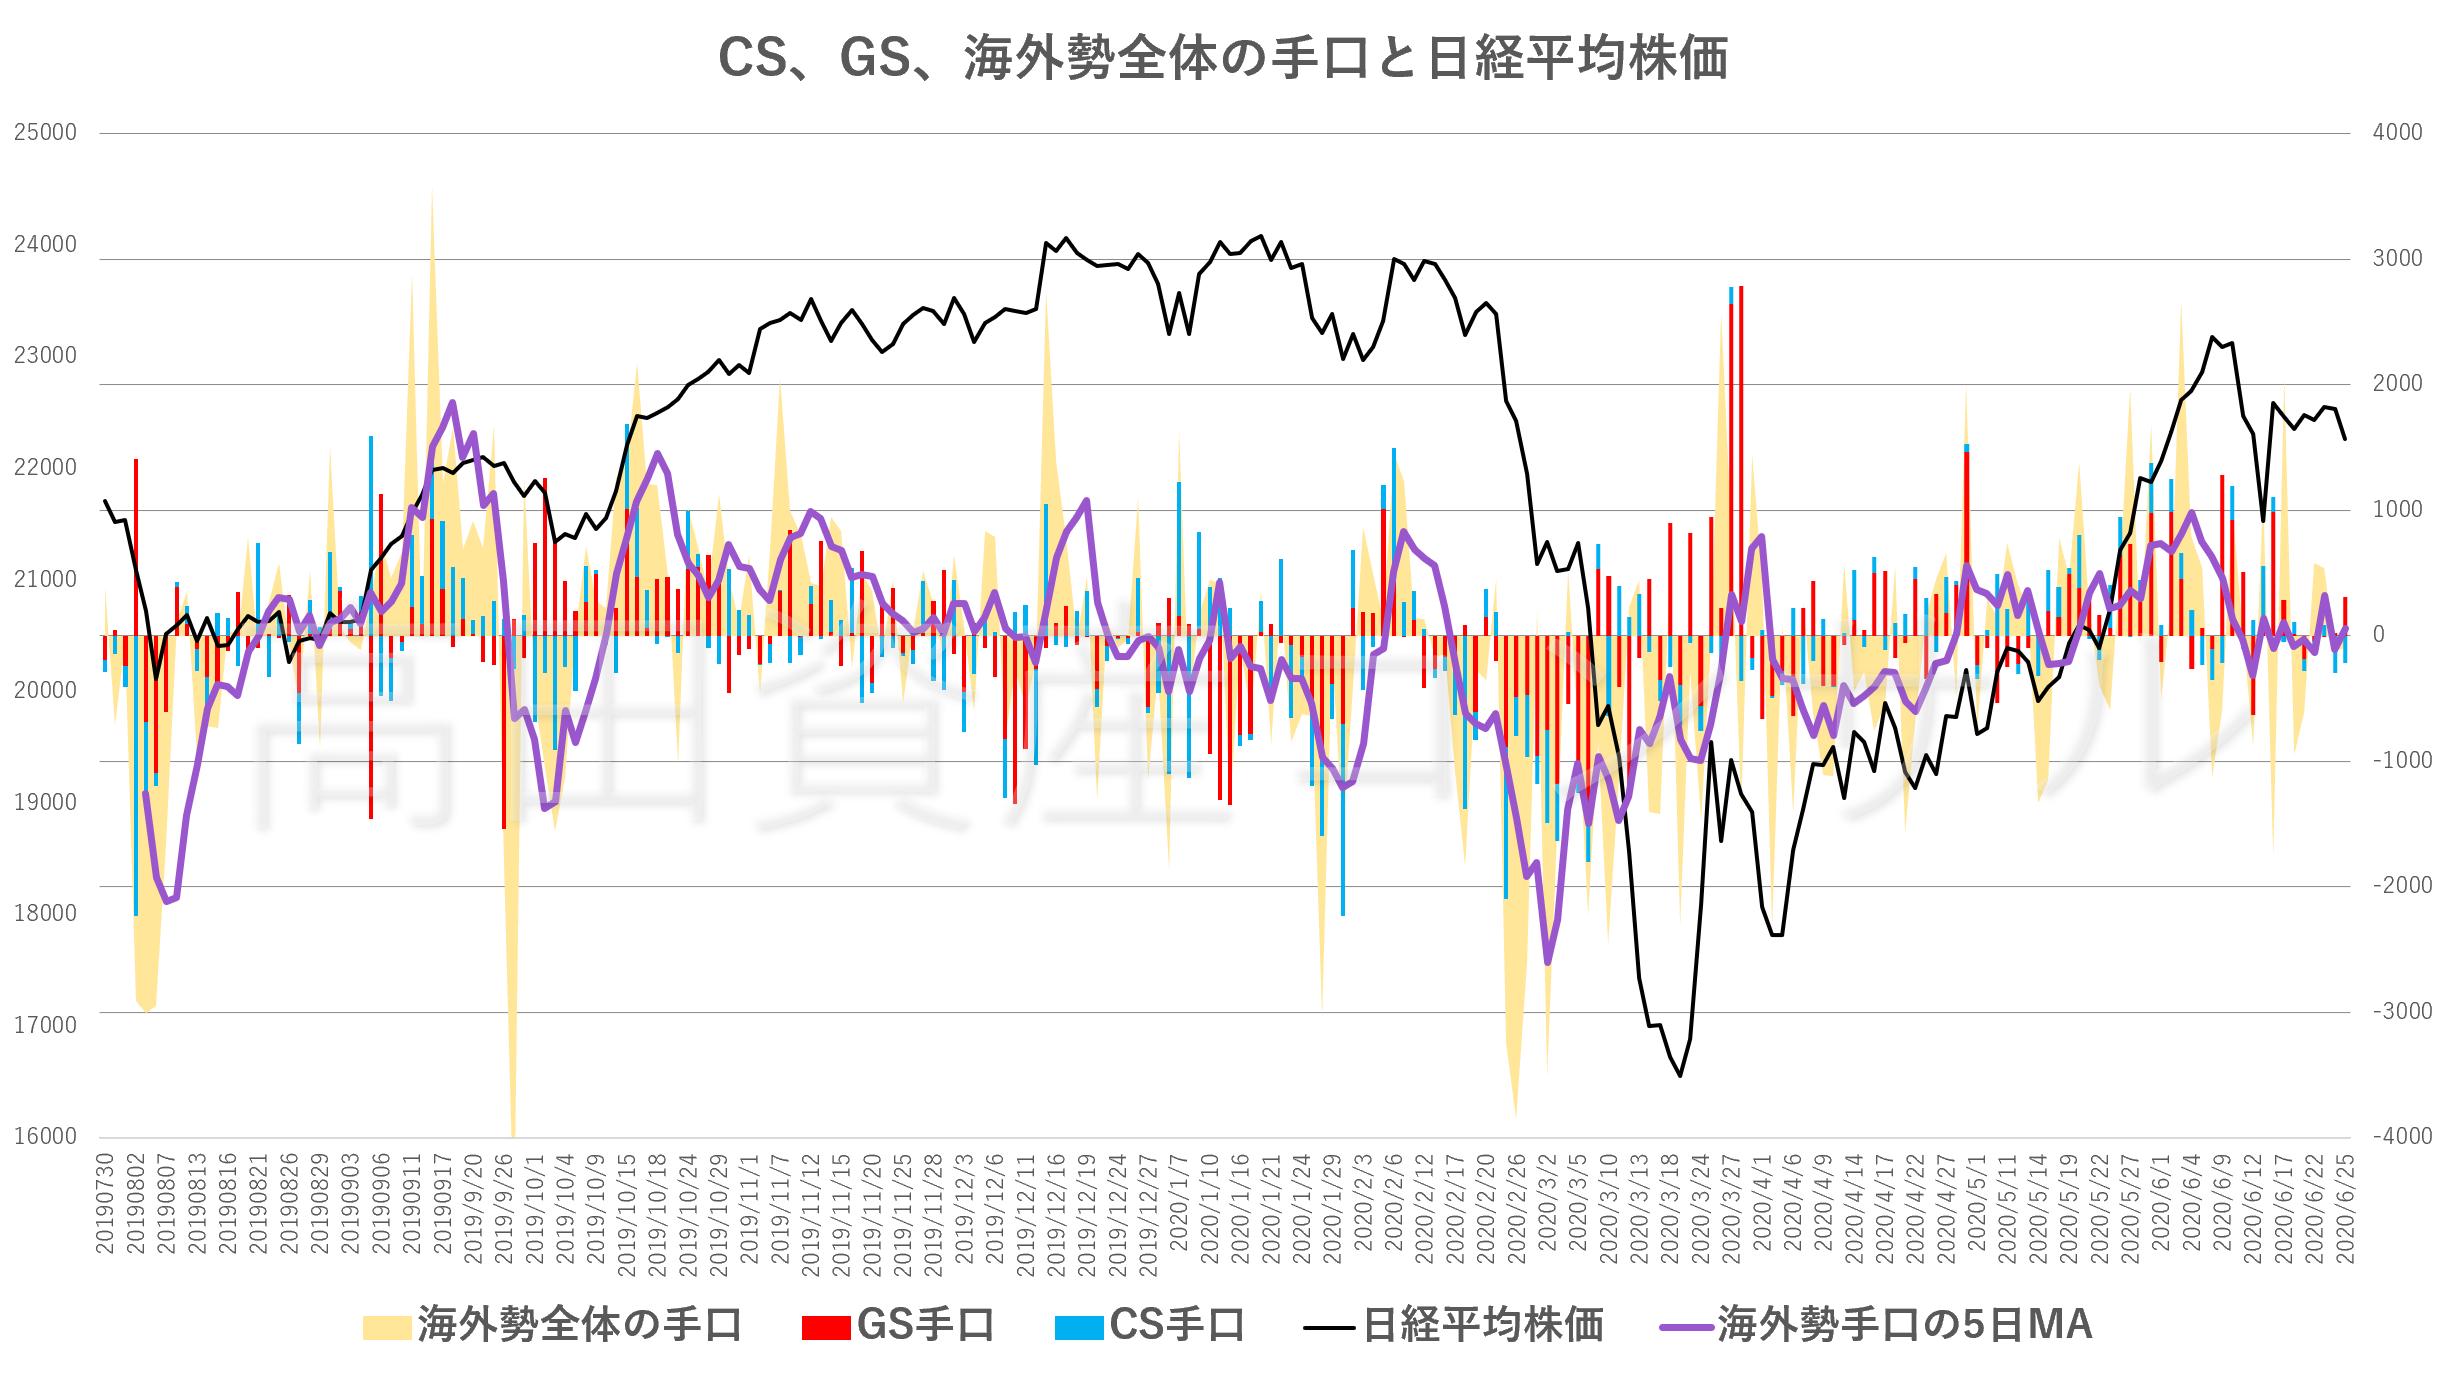 CS、GS、海外勢全体の手口と日経平均株価20200625